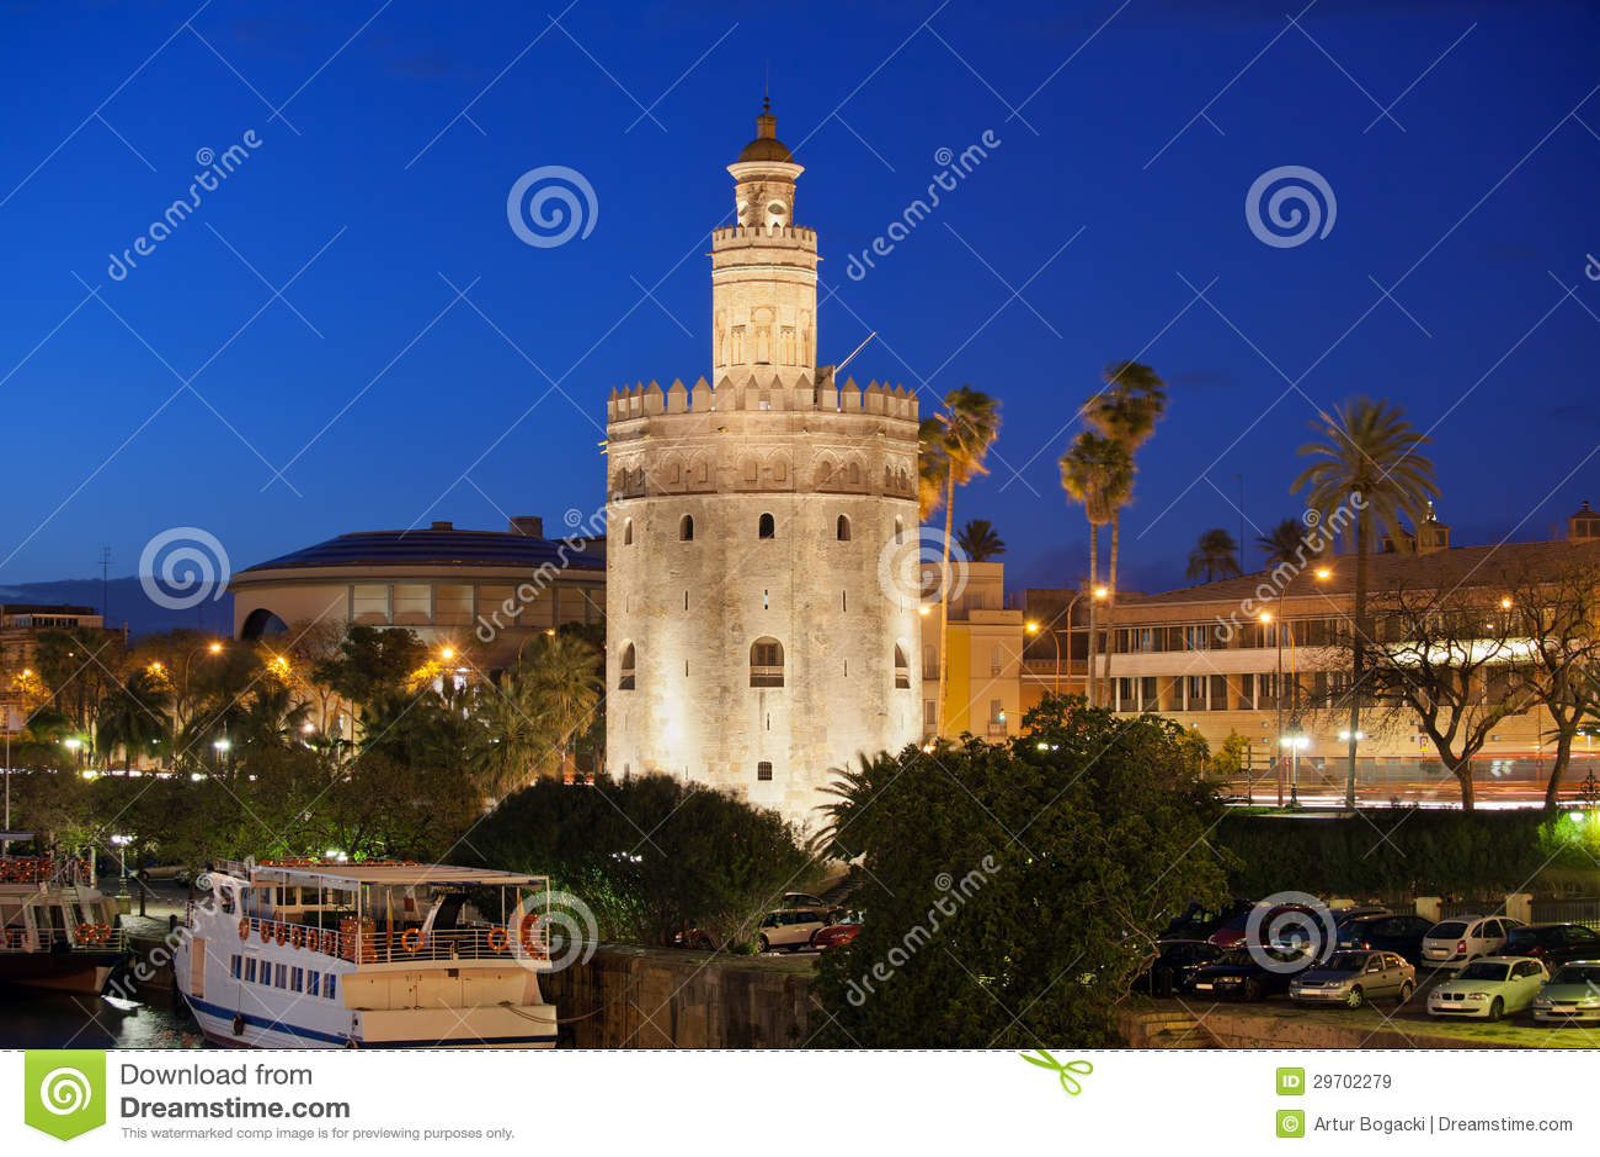 Torre del Oro at Night in Seville